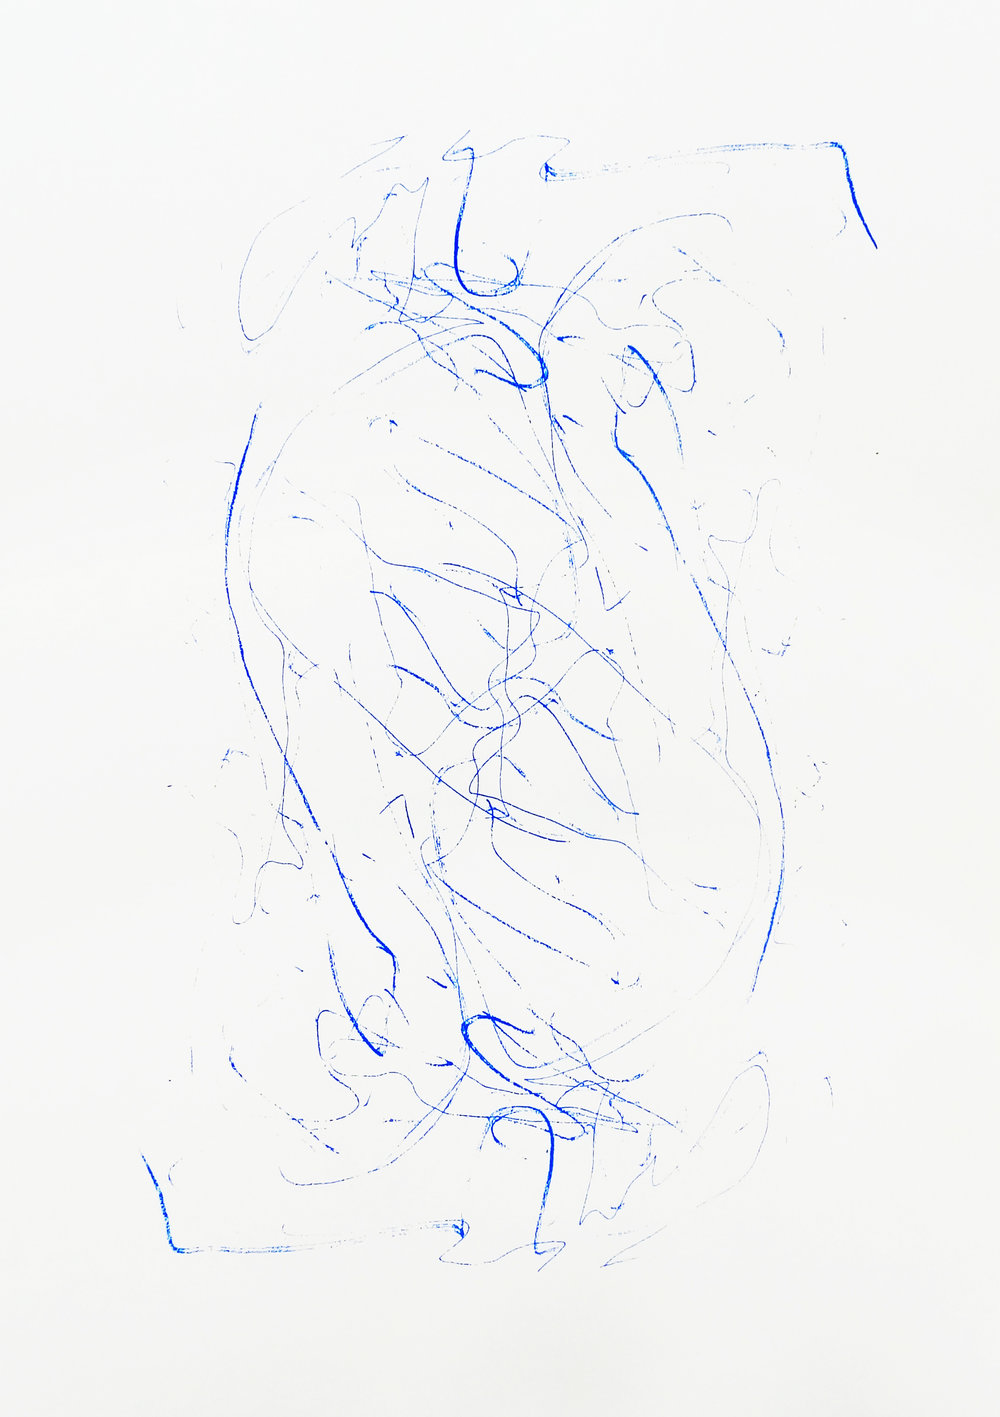 Untitled, 2015 acrylic on paper one-off screenprint 42,0 x 29,7 cm (5-15)